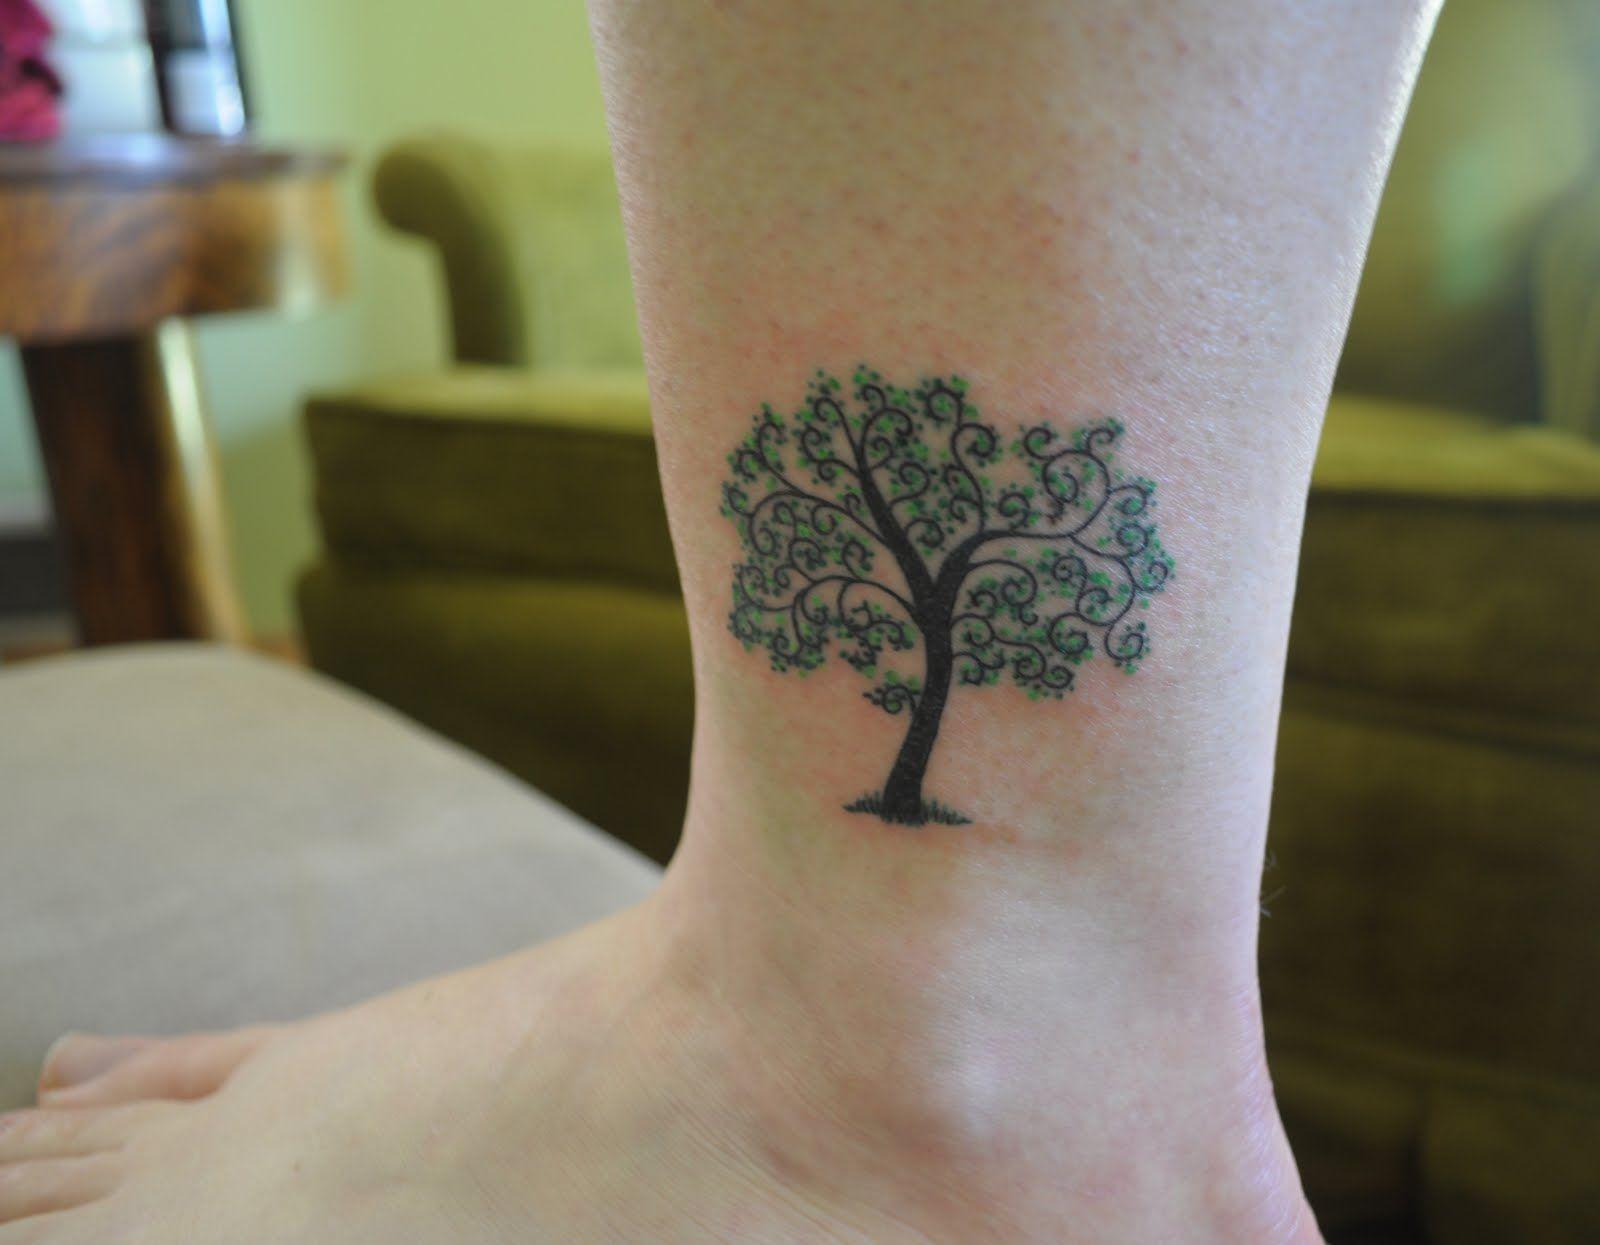 Small Tree Tattoos | Do you have any tattoos?